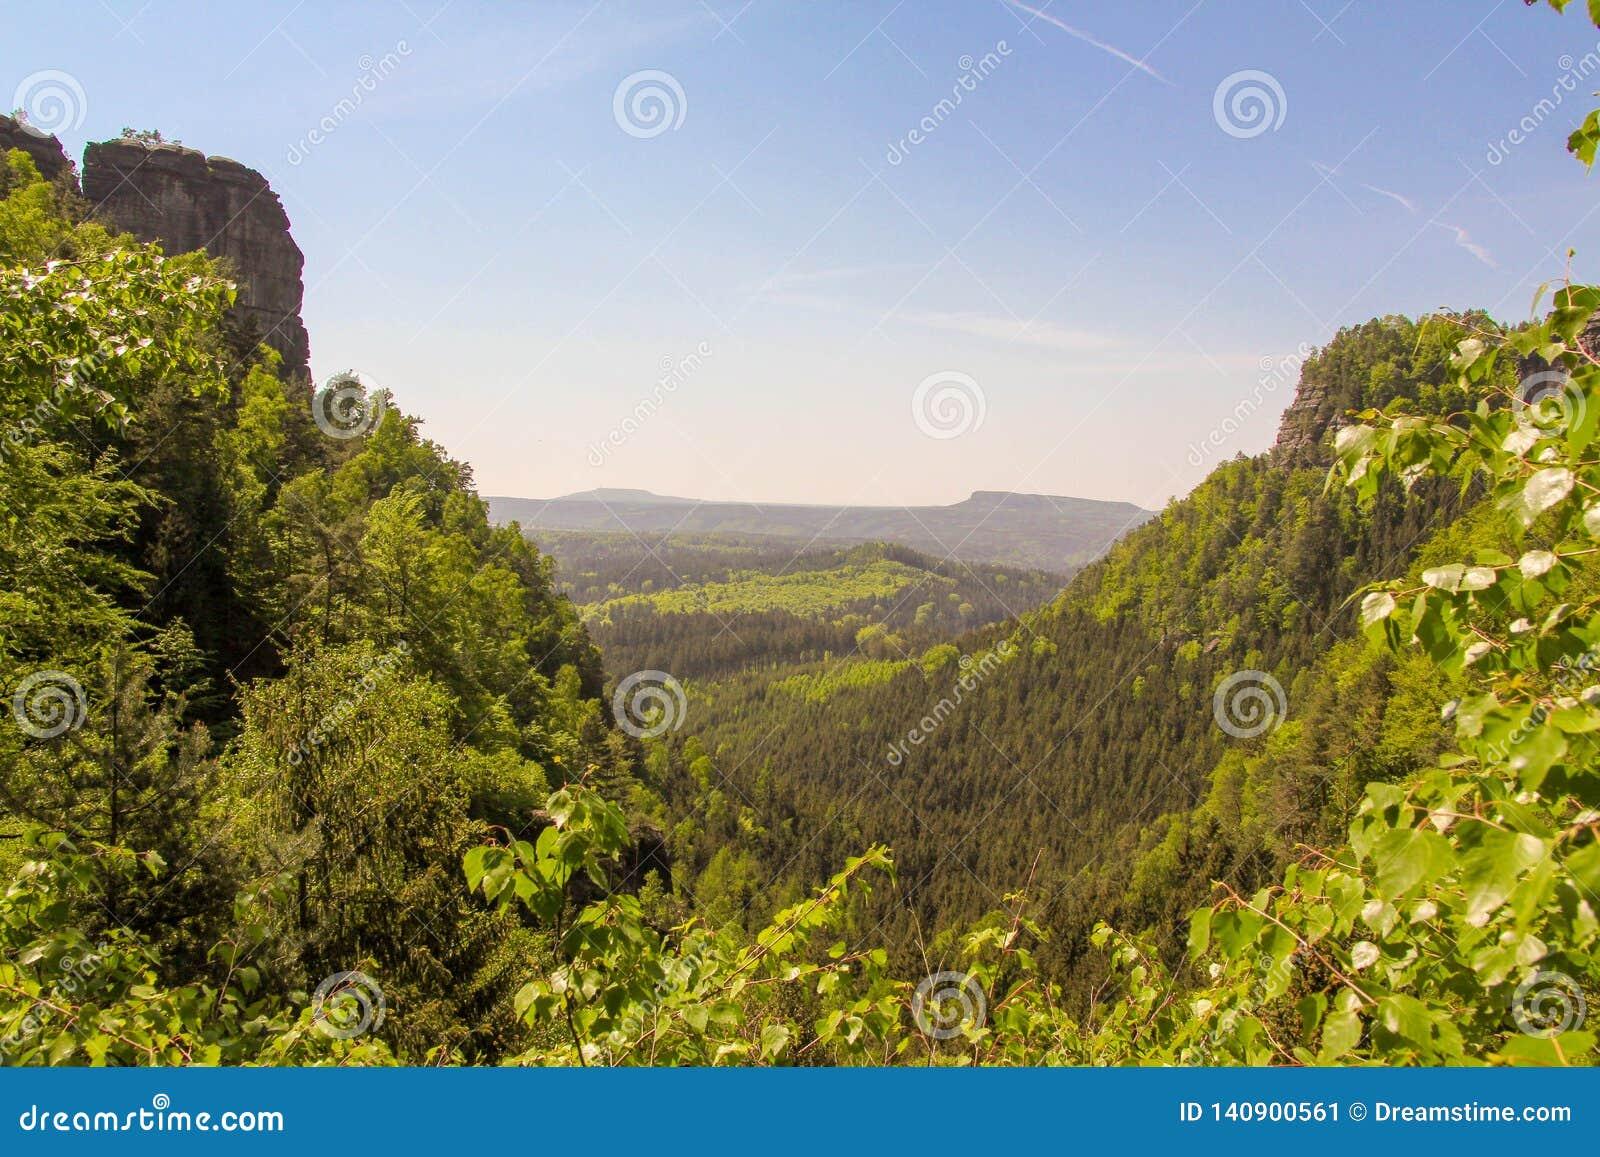 Montagne di Tatras coperte dalle abetaie verdi, repubblica Ceca